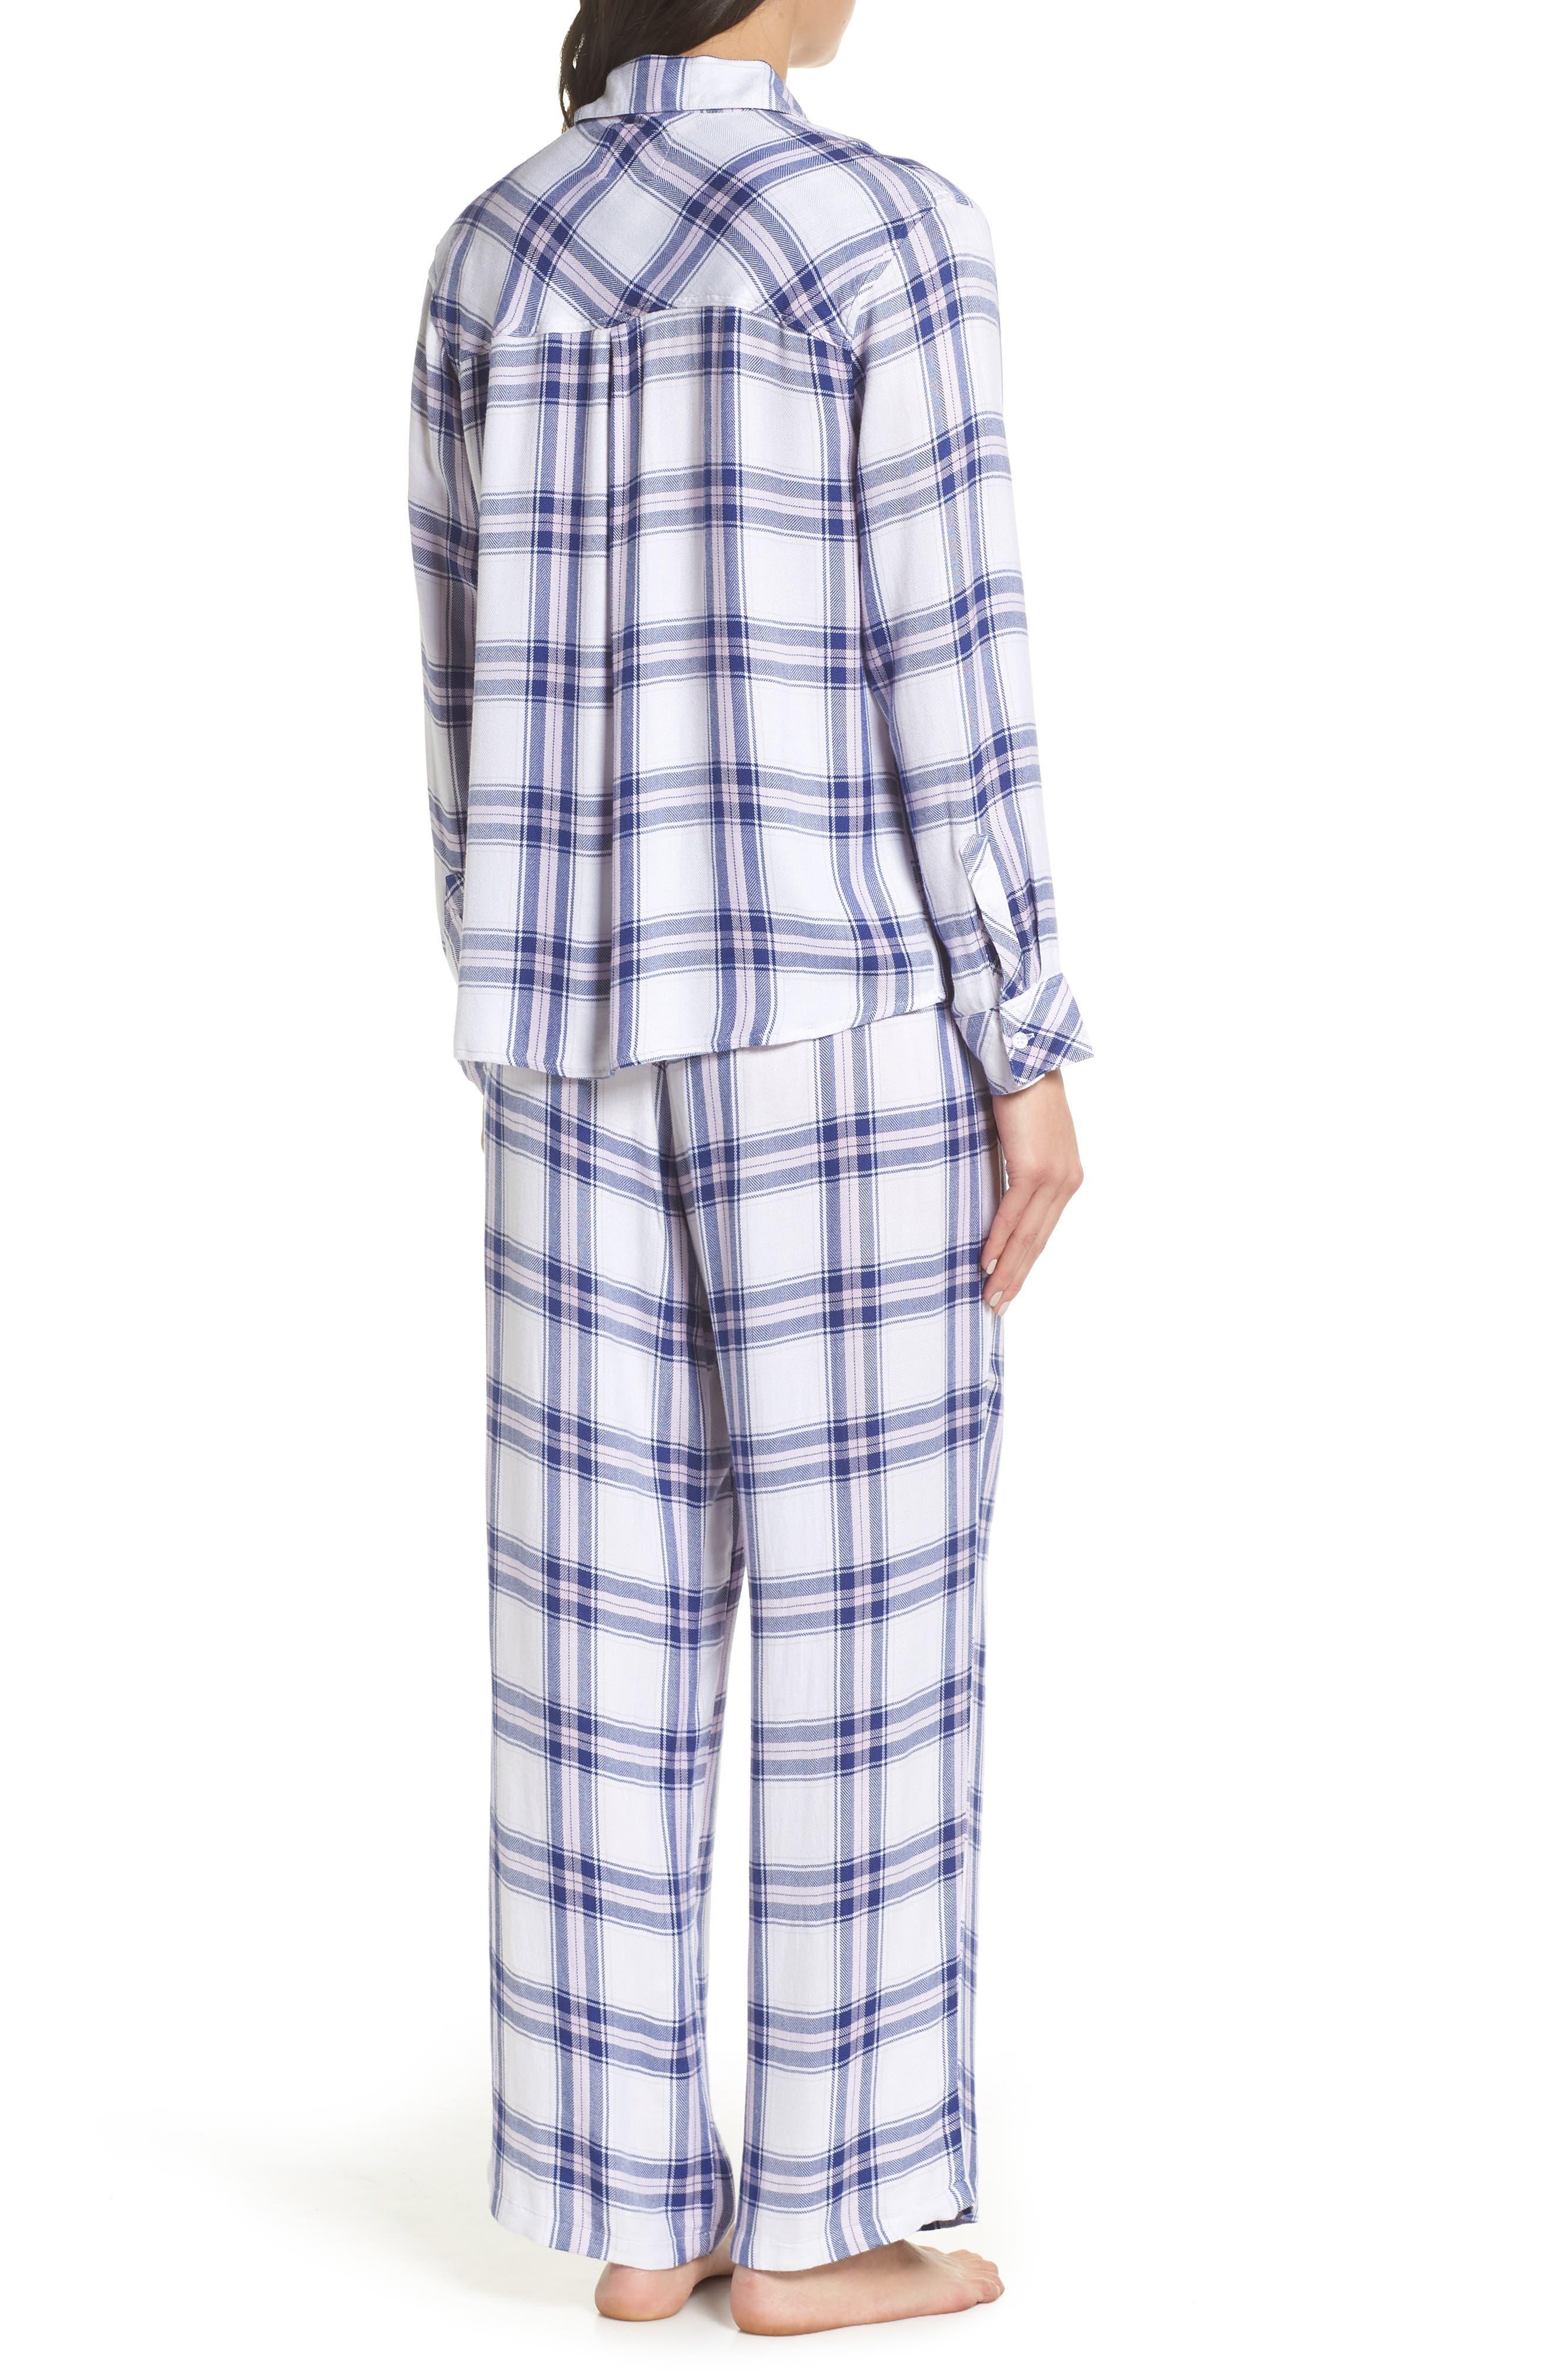 Plaid Pajamas,                             Alternate thumbnail 2, color,                             WHITE SAPPHIRE LILAC